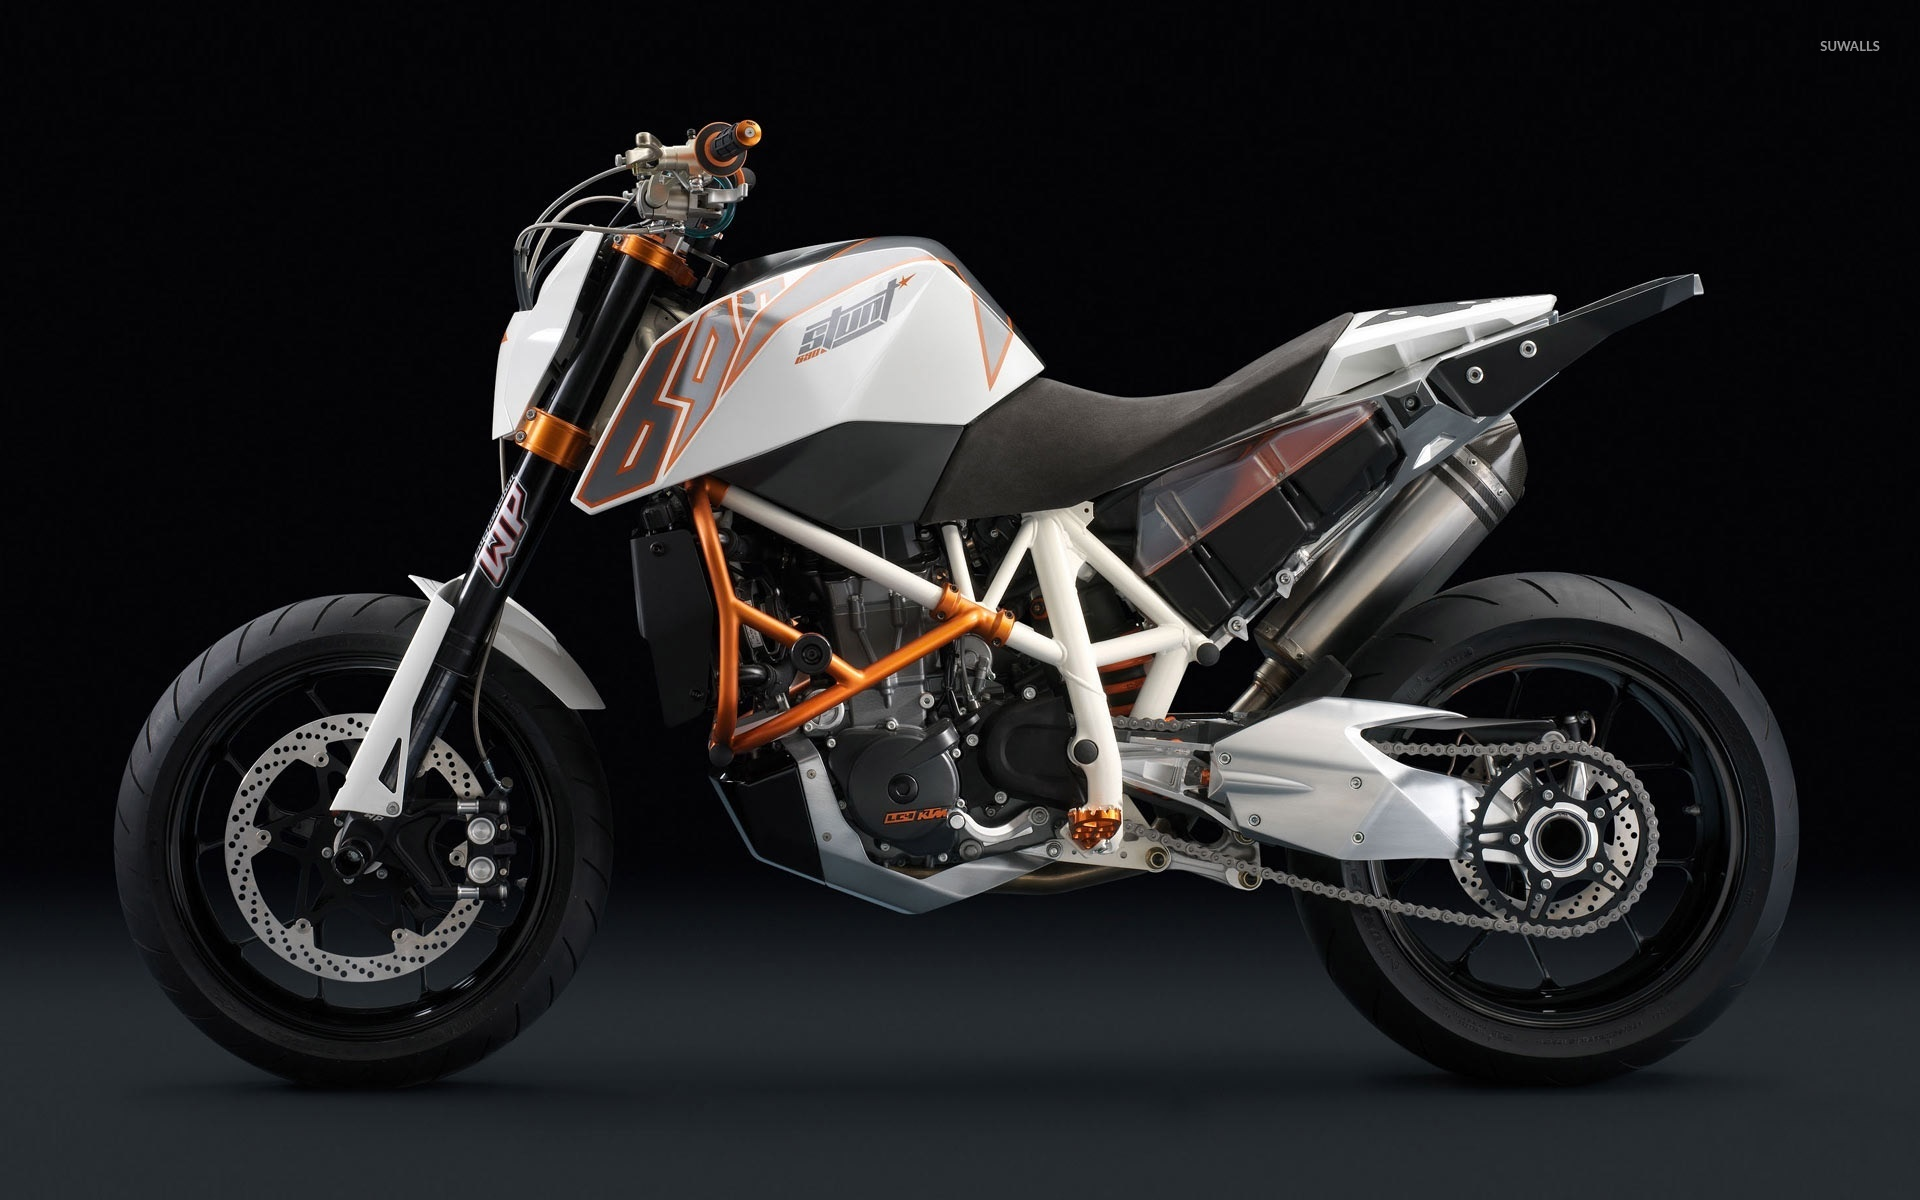 KTM 690 Duke R [2] wallpaper   Motorcycle wallpapers   24059 1920x1200